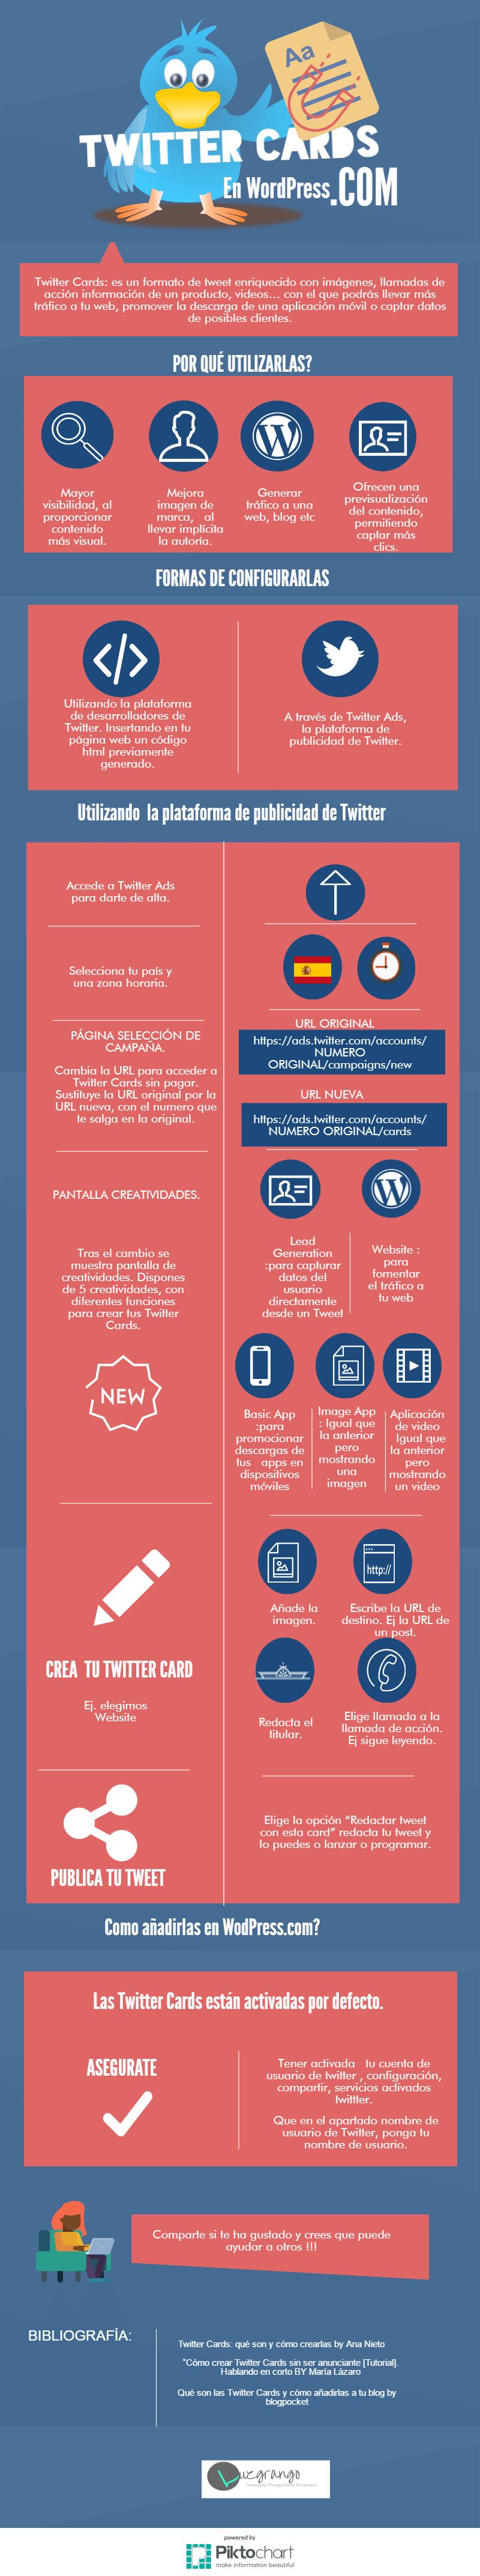 Twitter -Cards-Infografia-wordpress.com